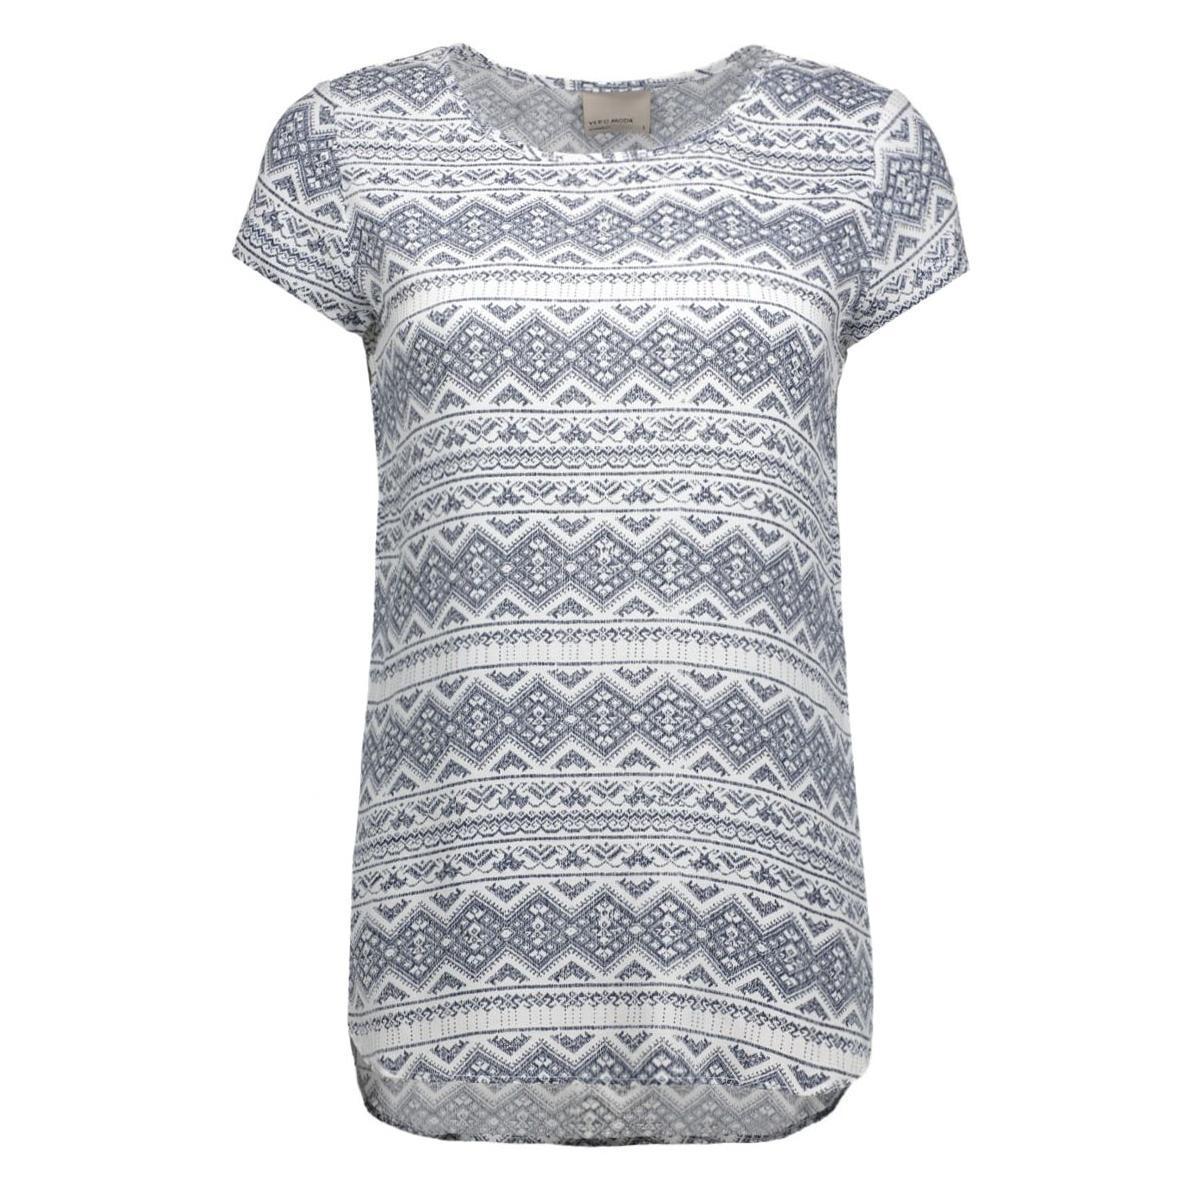 vmboca ss blouse print 10128072 vero moda t-shirt snow white/graphic